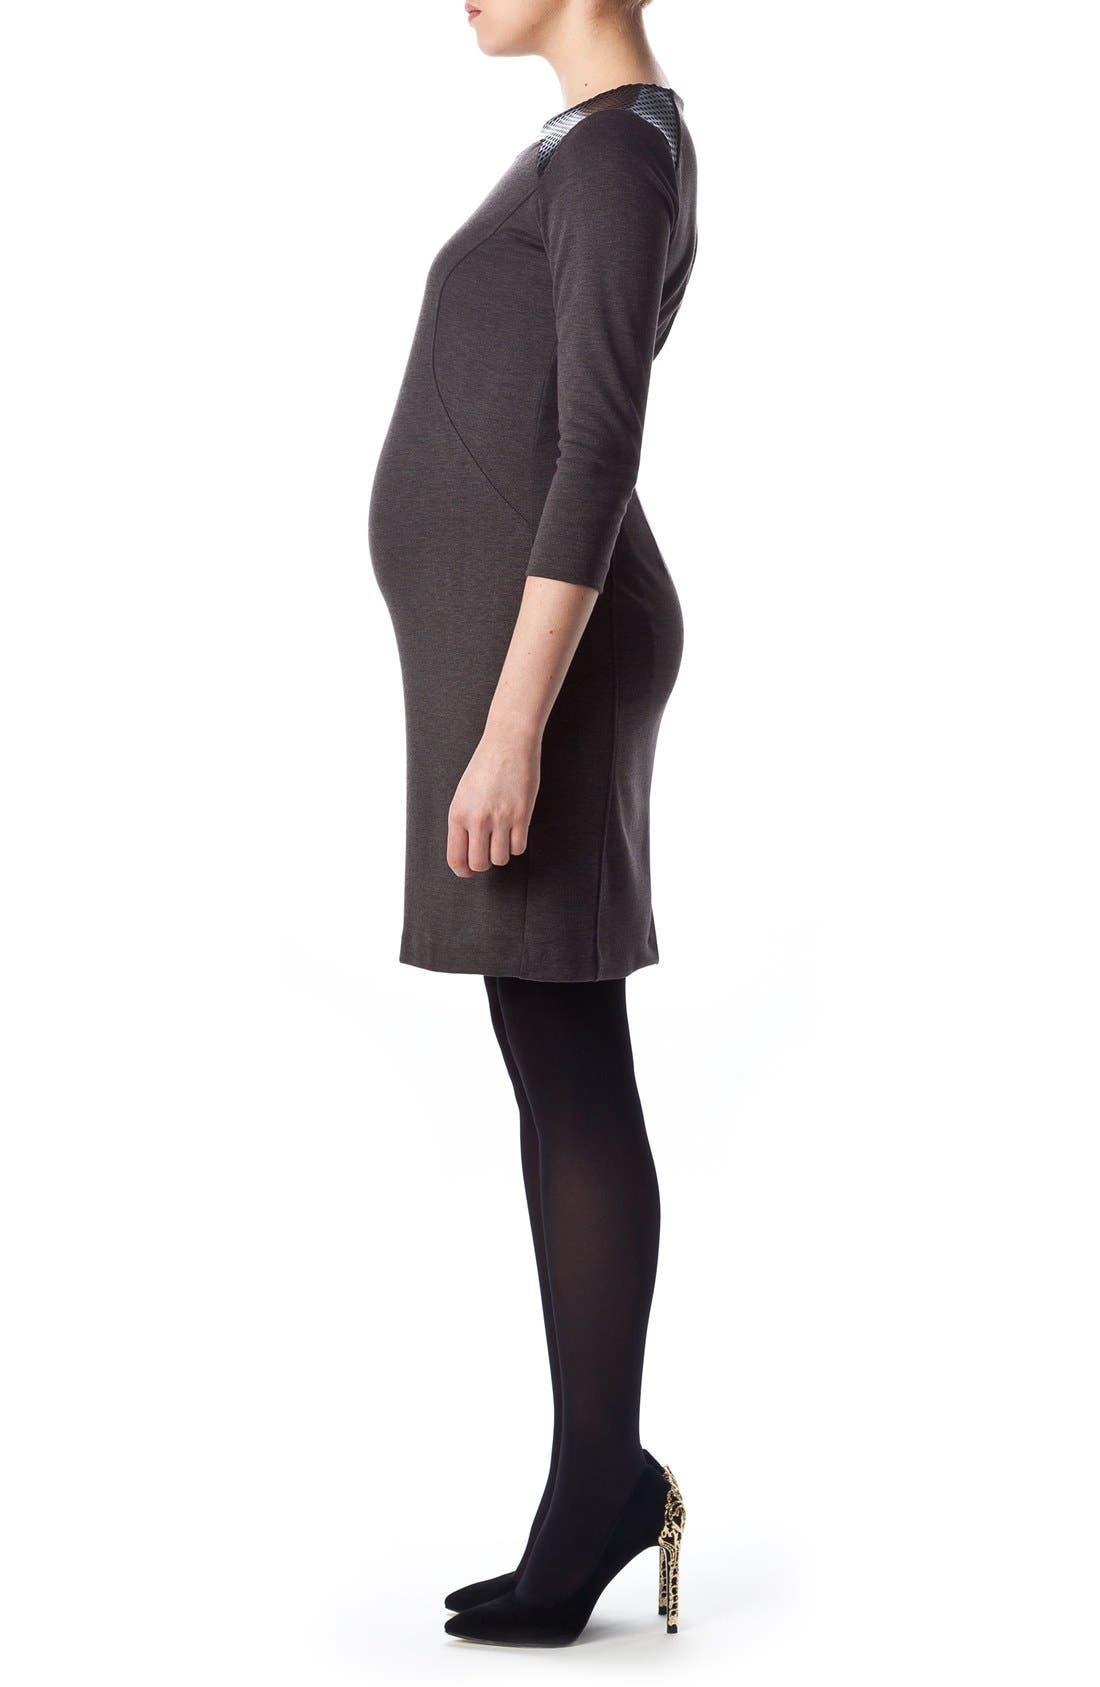 Milano Ponte Dress,                             Alternate thumbnail 3, color,                             Dark Grey Melange/ Black